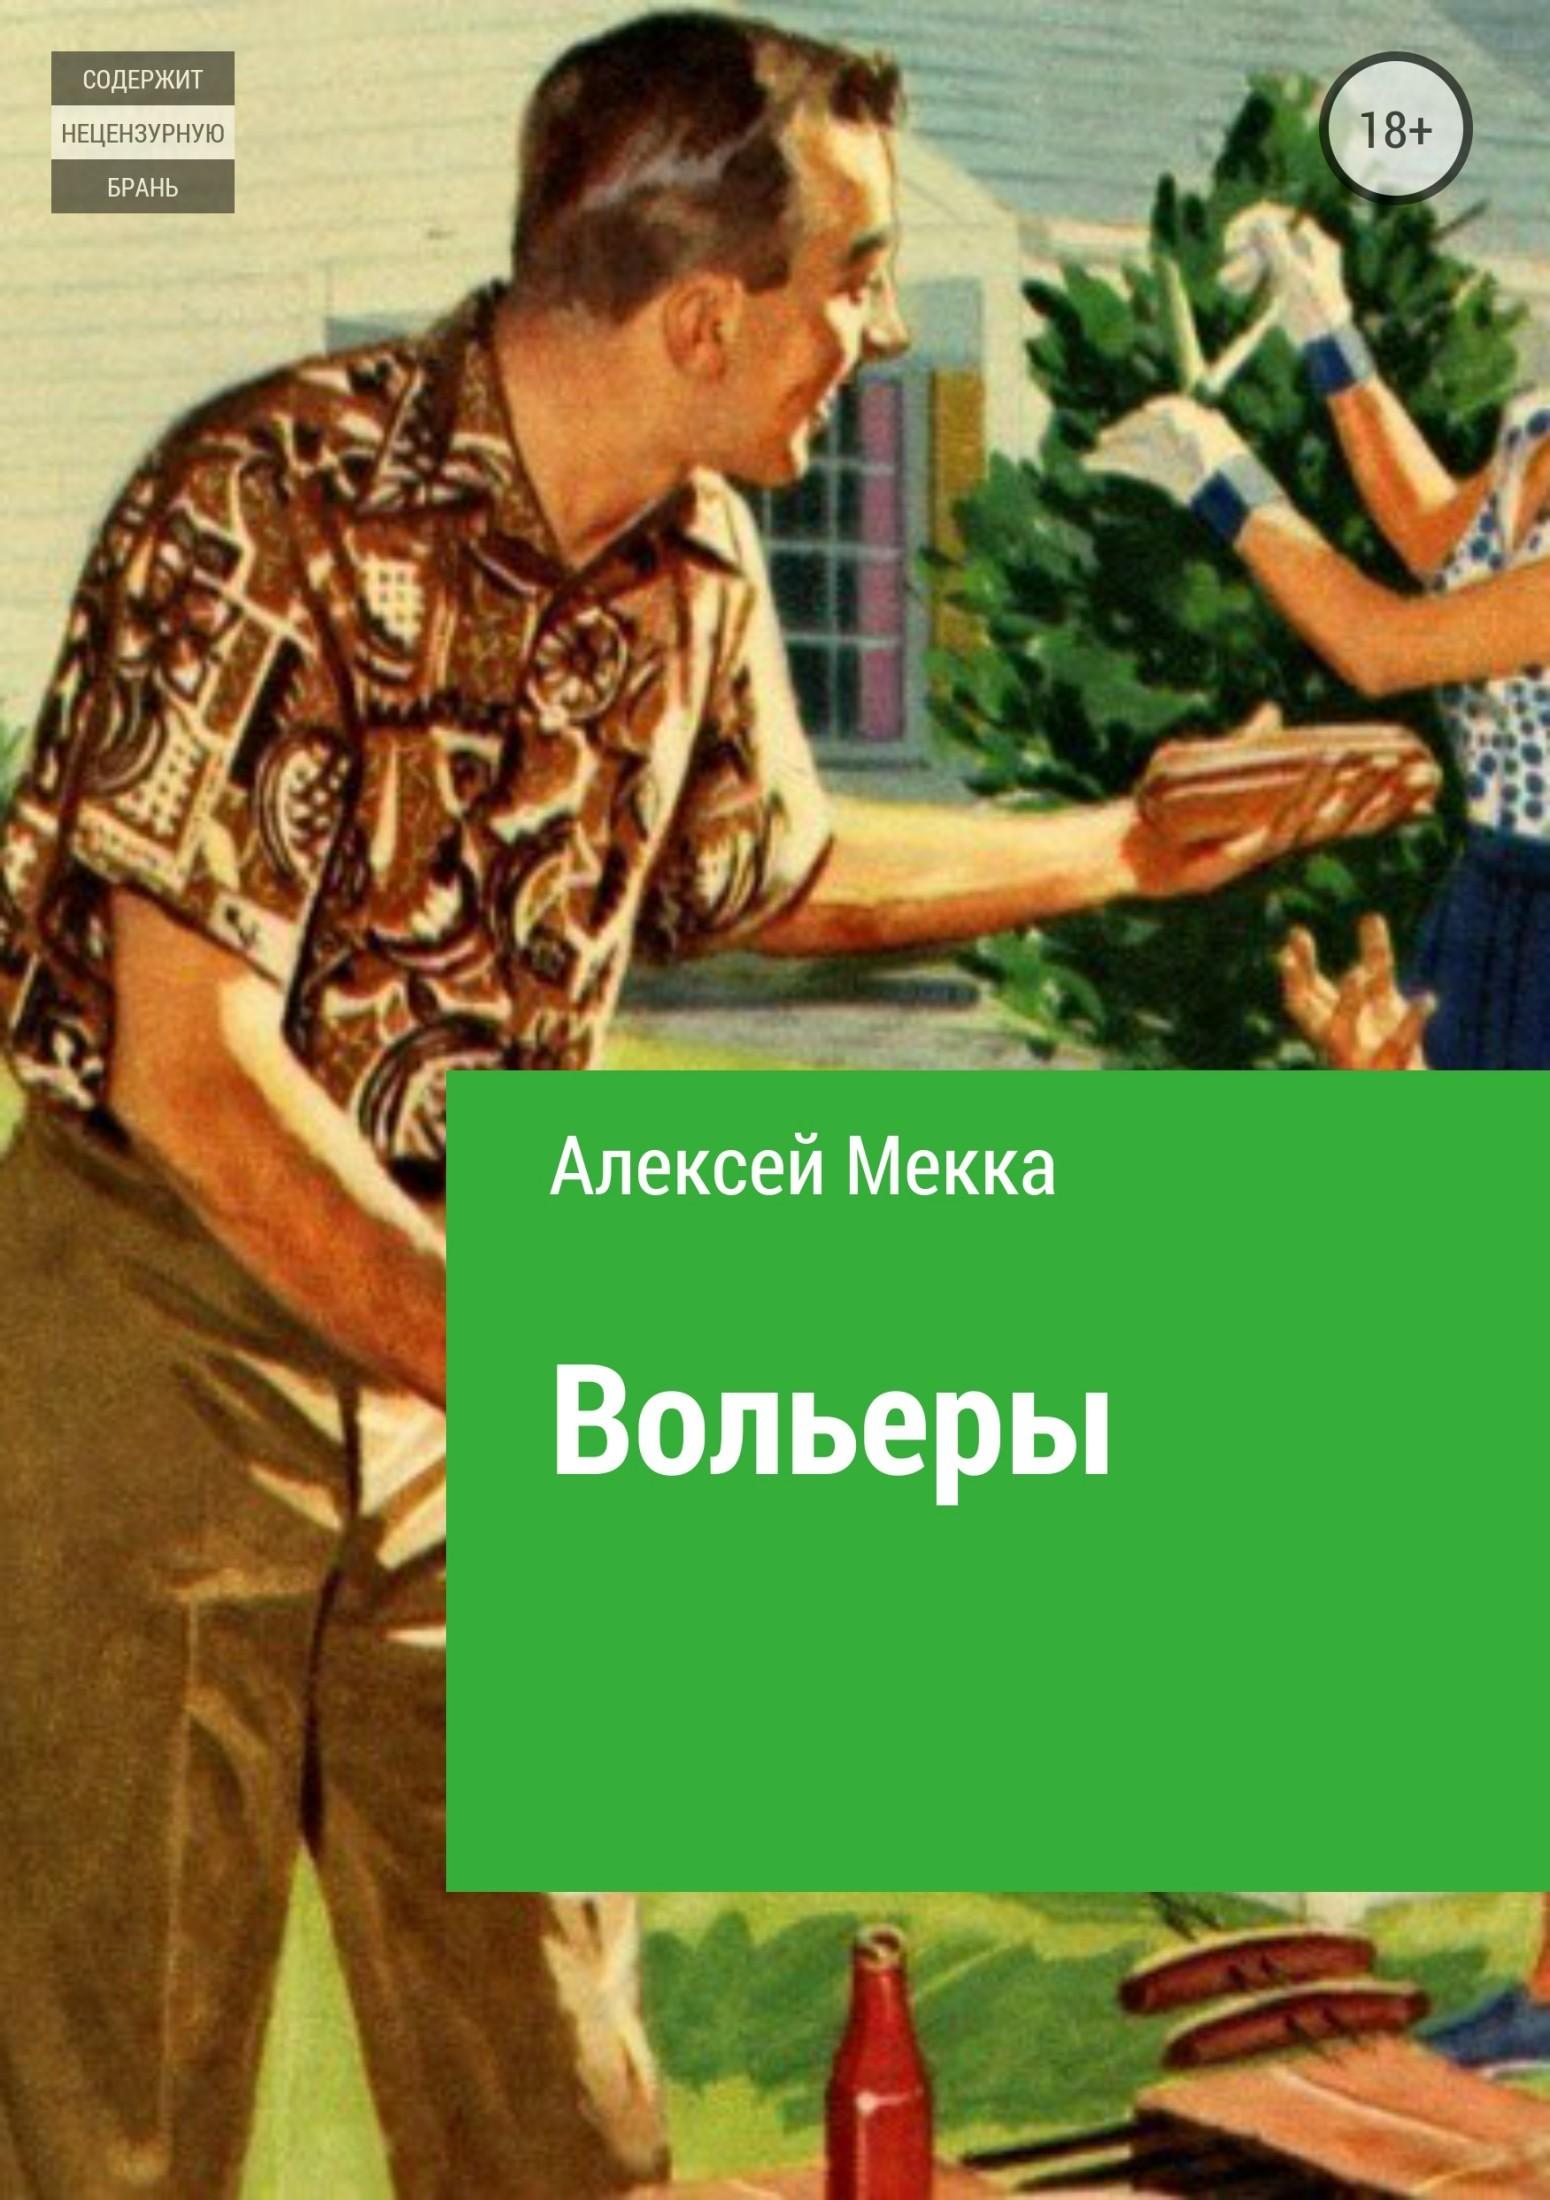 Фото - Алексей Витальевич Мекка Вольеры алексей витальевич мекка сандалики